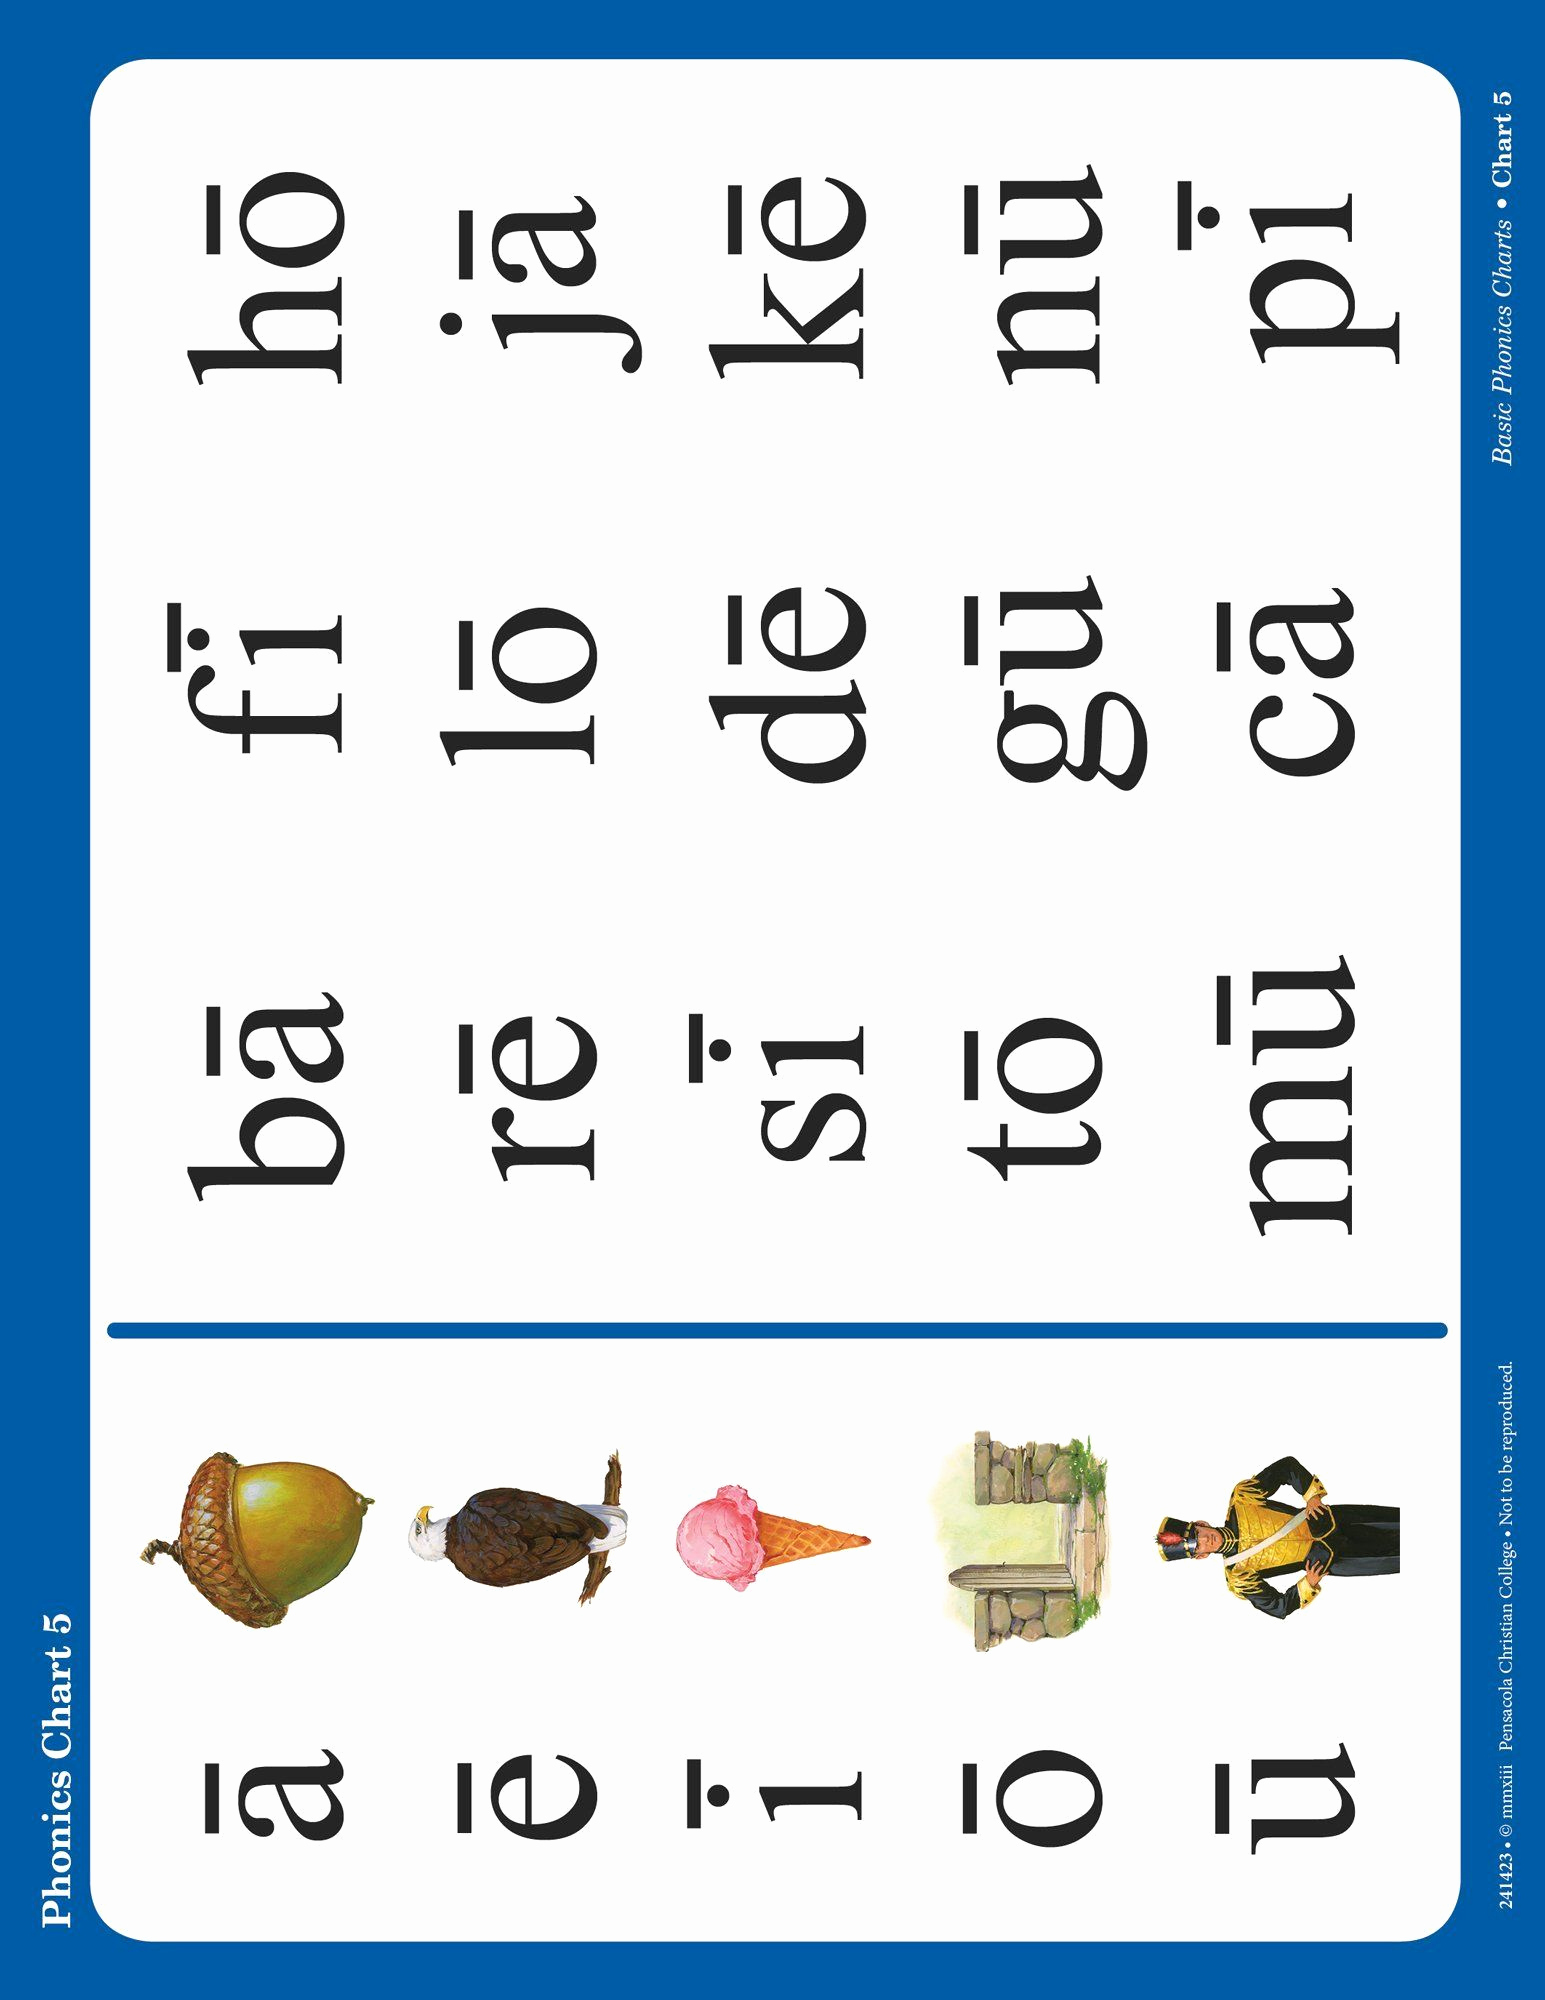 Free Printable Abeka Worksheets Luxury Free Printable Abeka Worksheets Abeka Vowel Chart